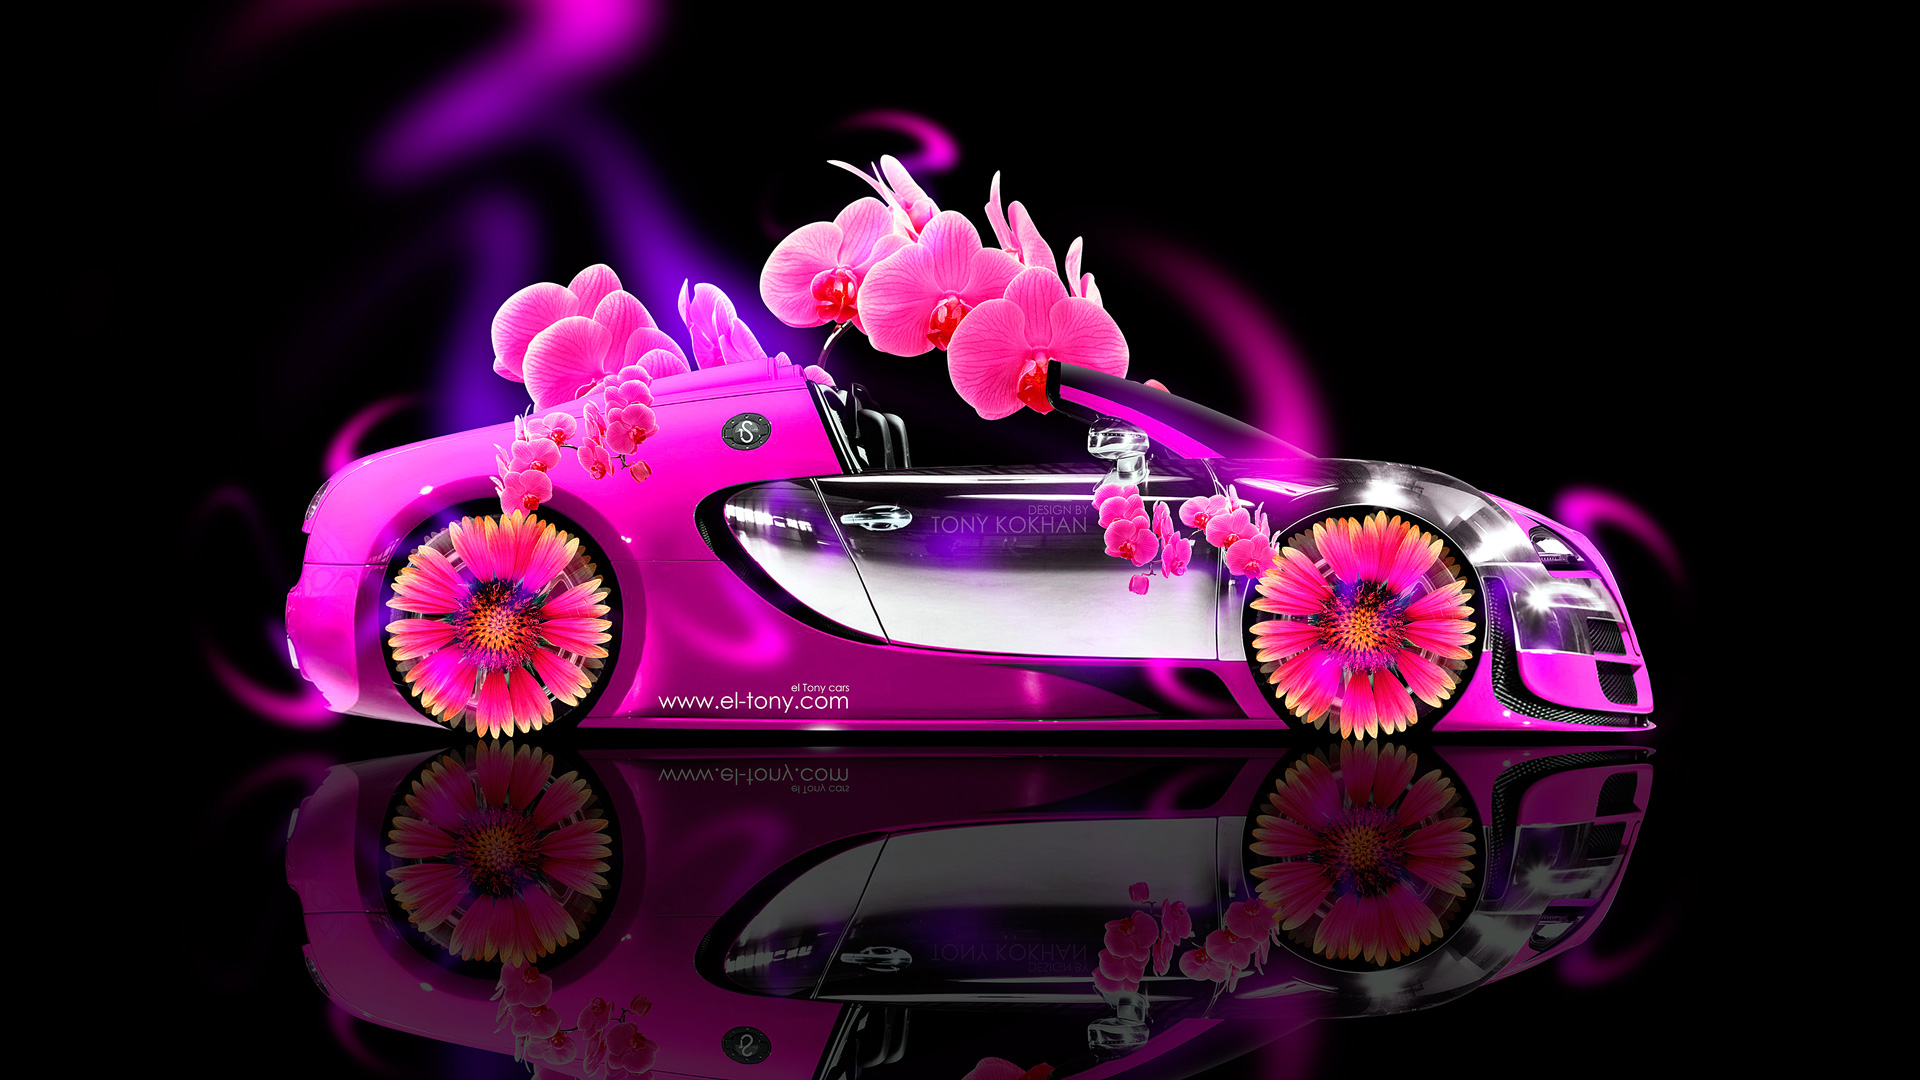 Bugatti Veyron Roadster Side Fantasy Flowers Neon Car 2014 HD Wallpapers Design By Tony Kokhan El 1920x1080